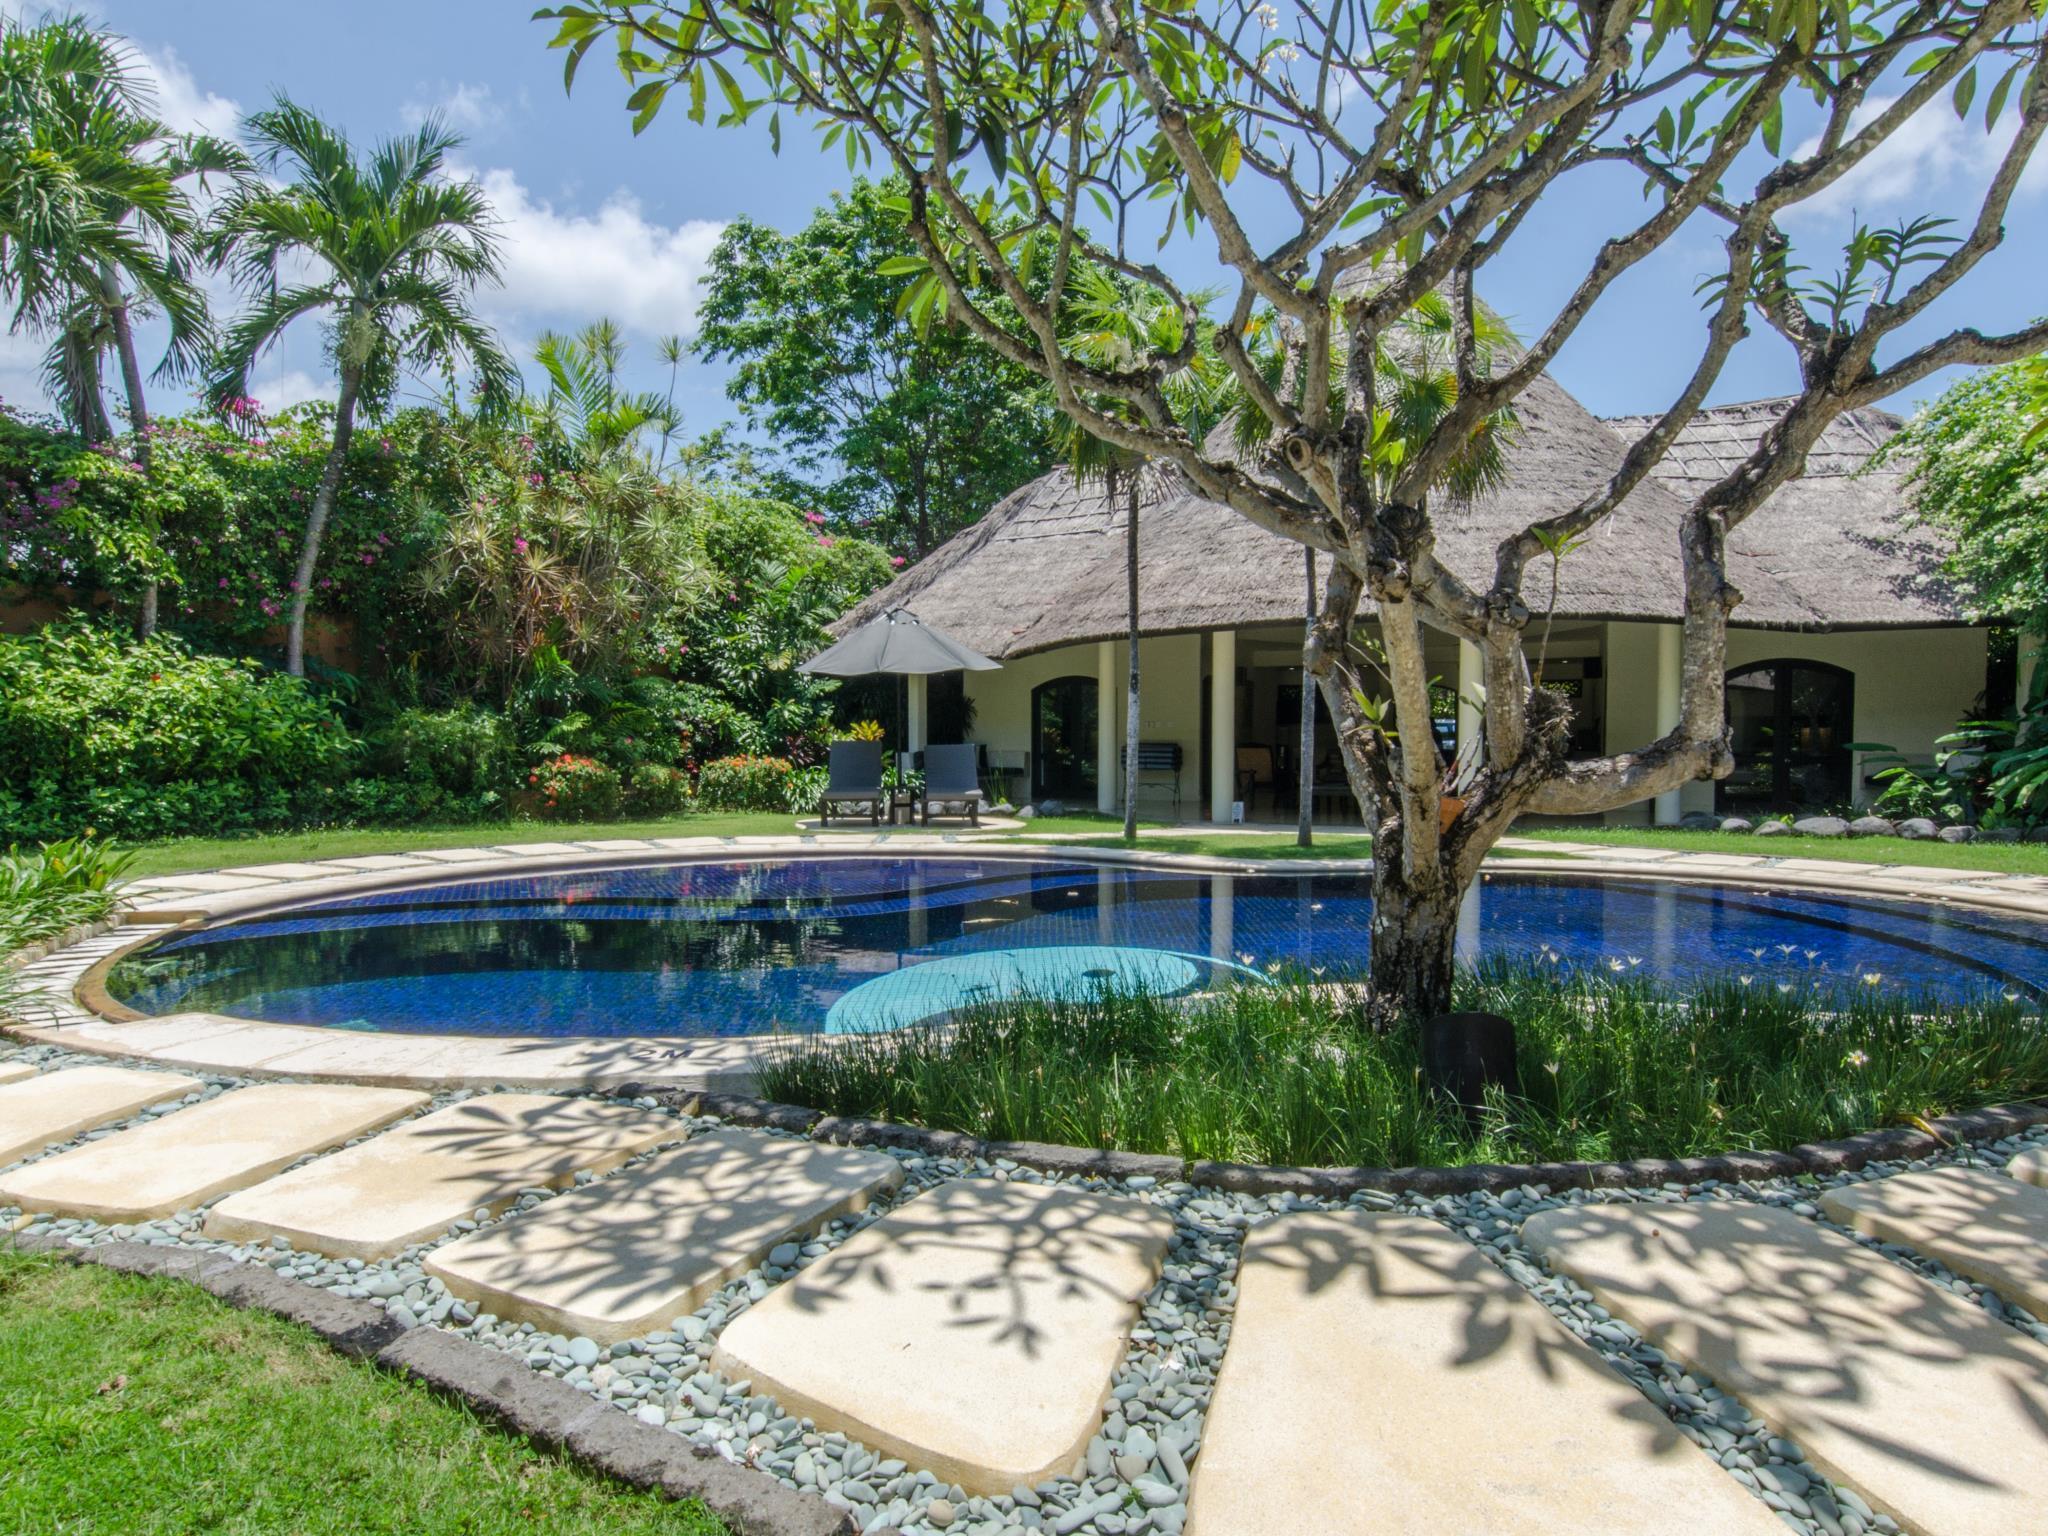 The Villas Bali Hotel & Spa ホテル詳細